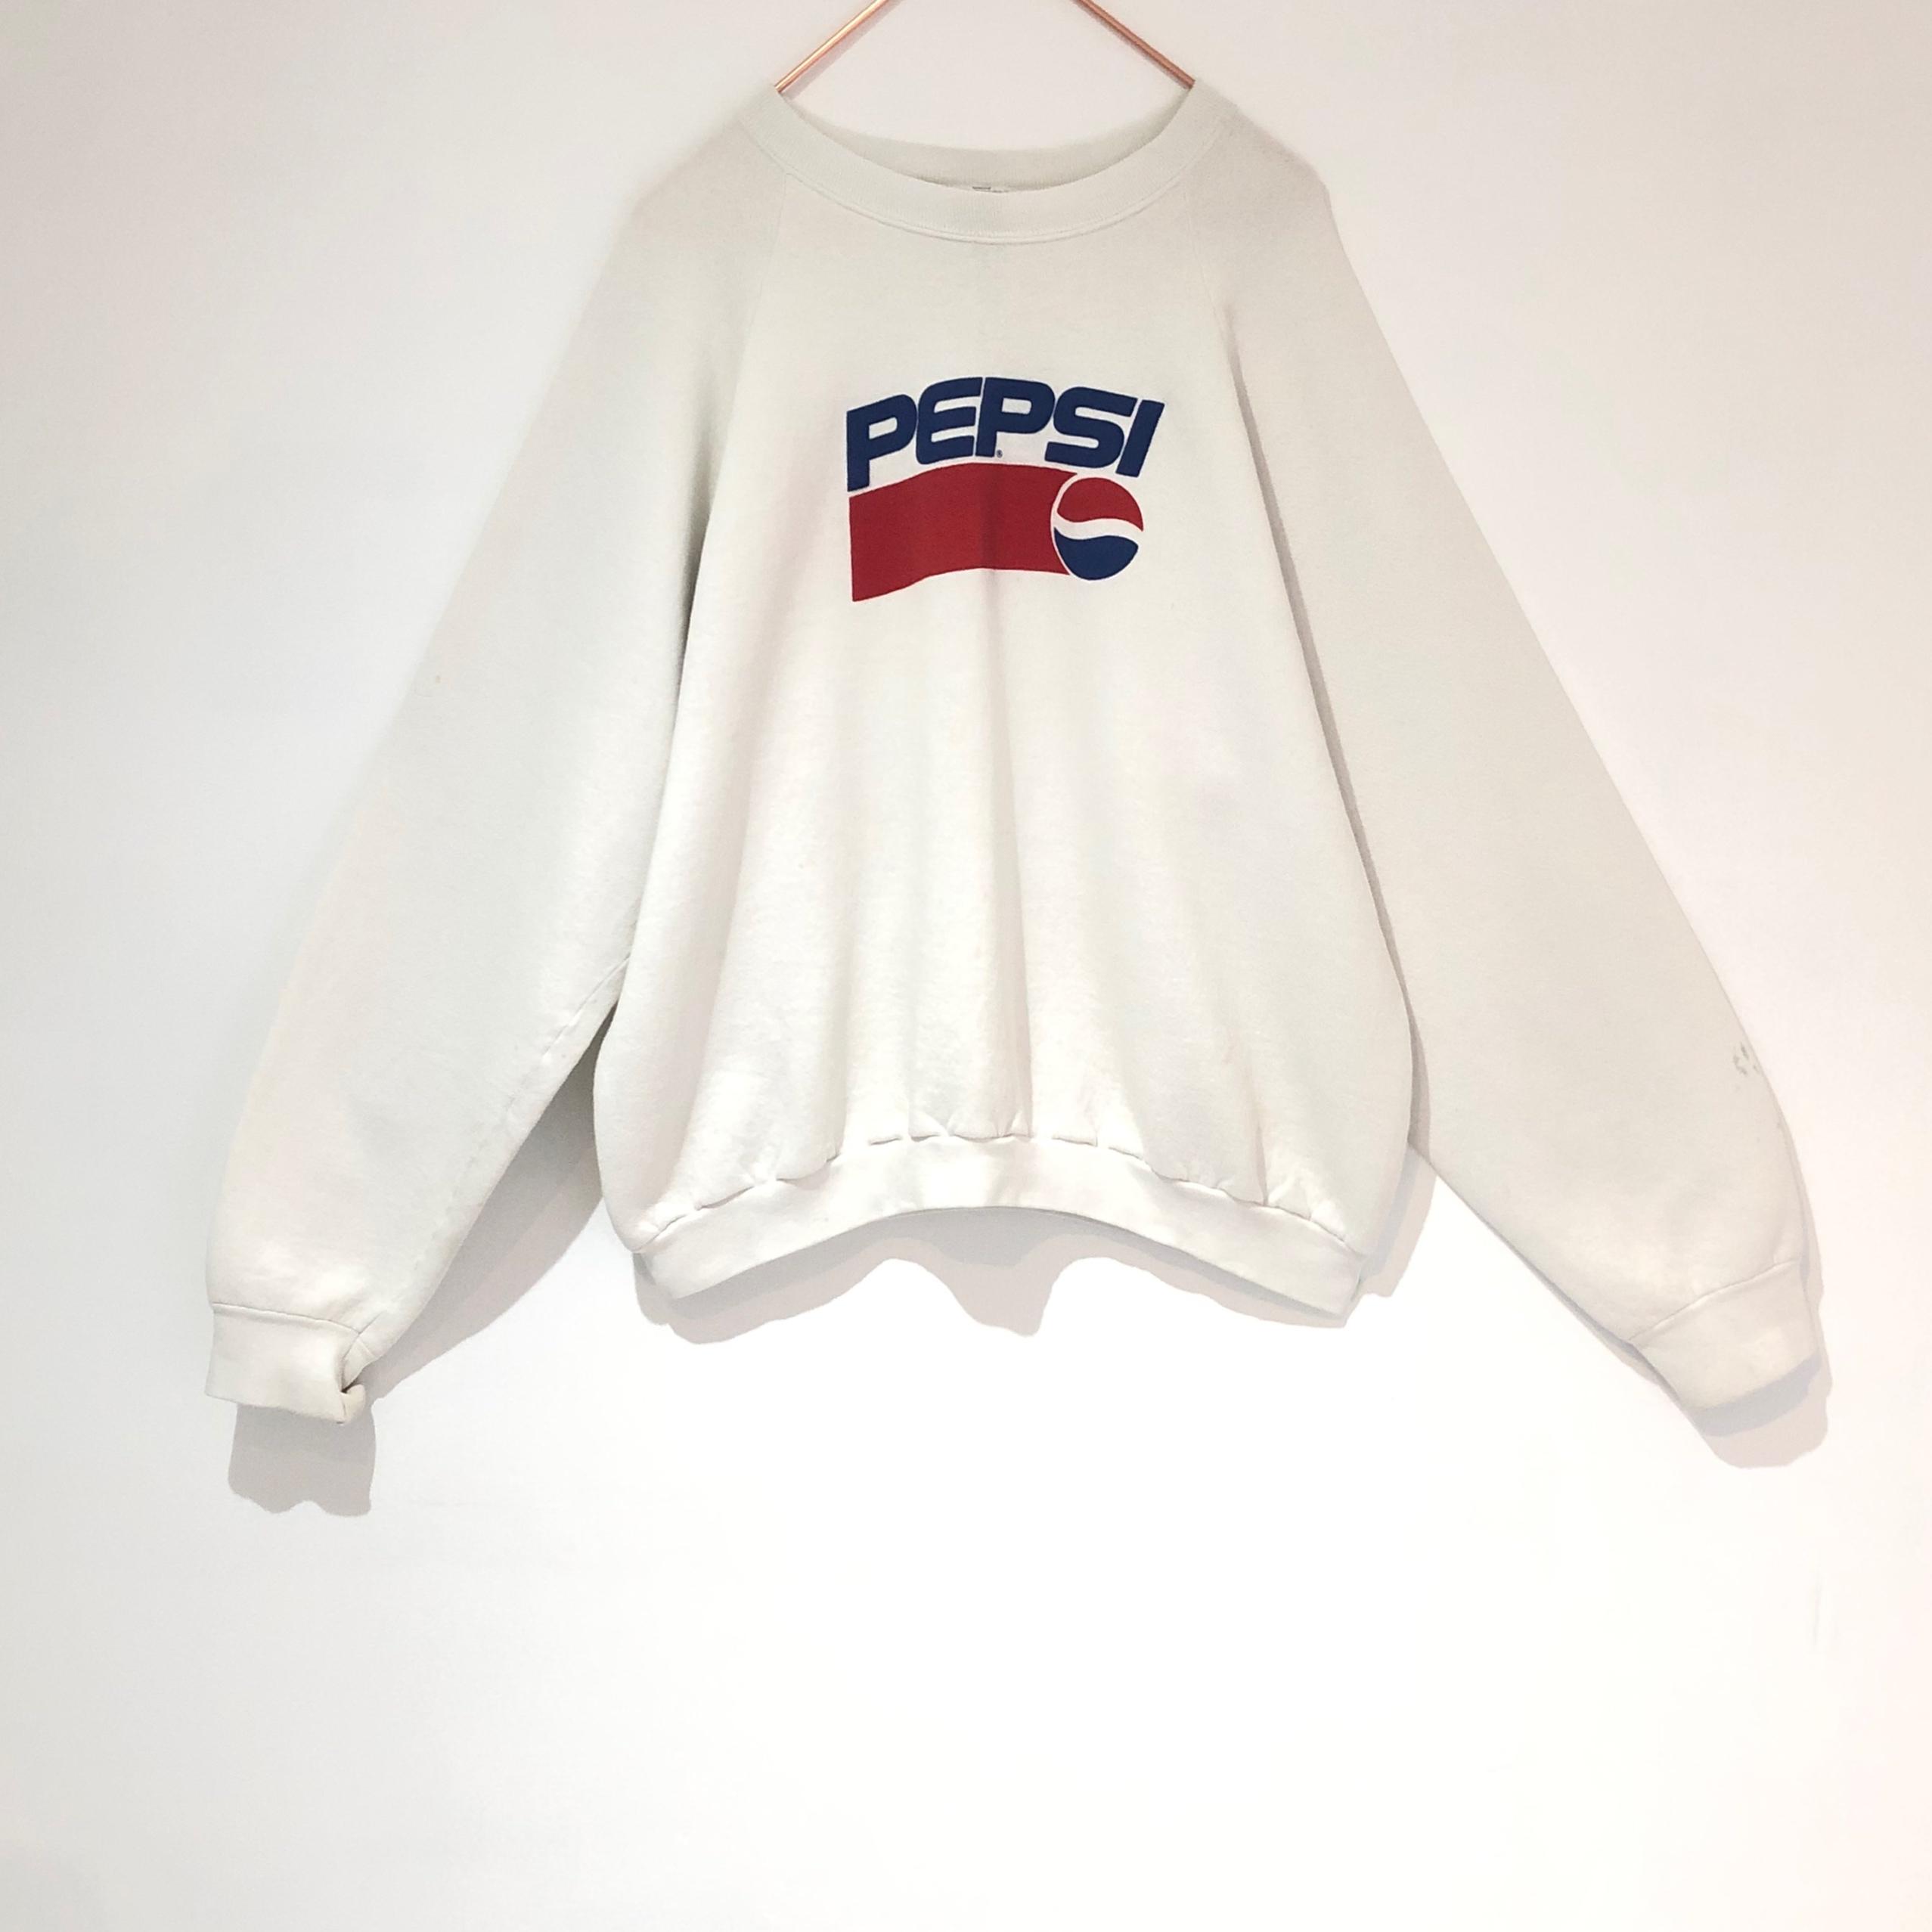 ◼︎80s vintage PEPSI print sweatshirt from U.S.A.◼︎